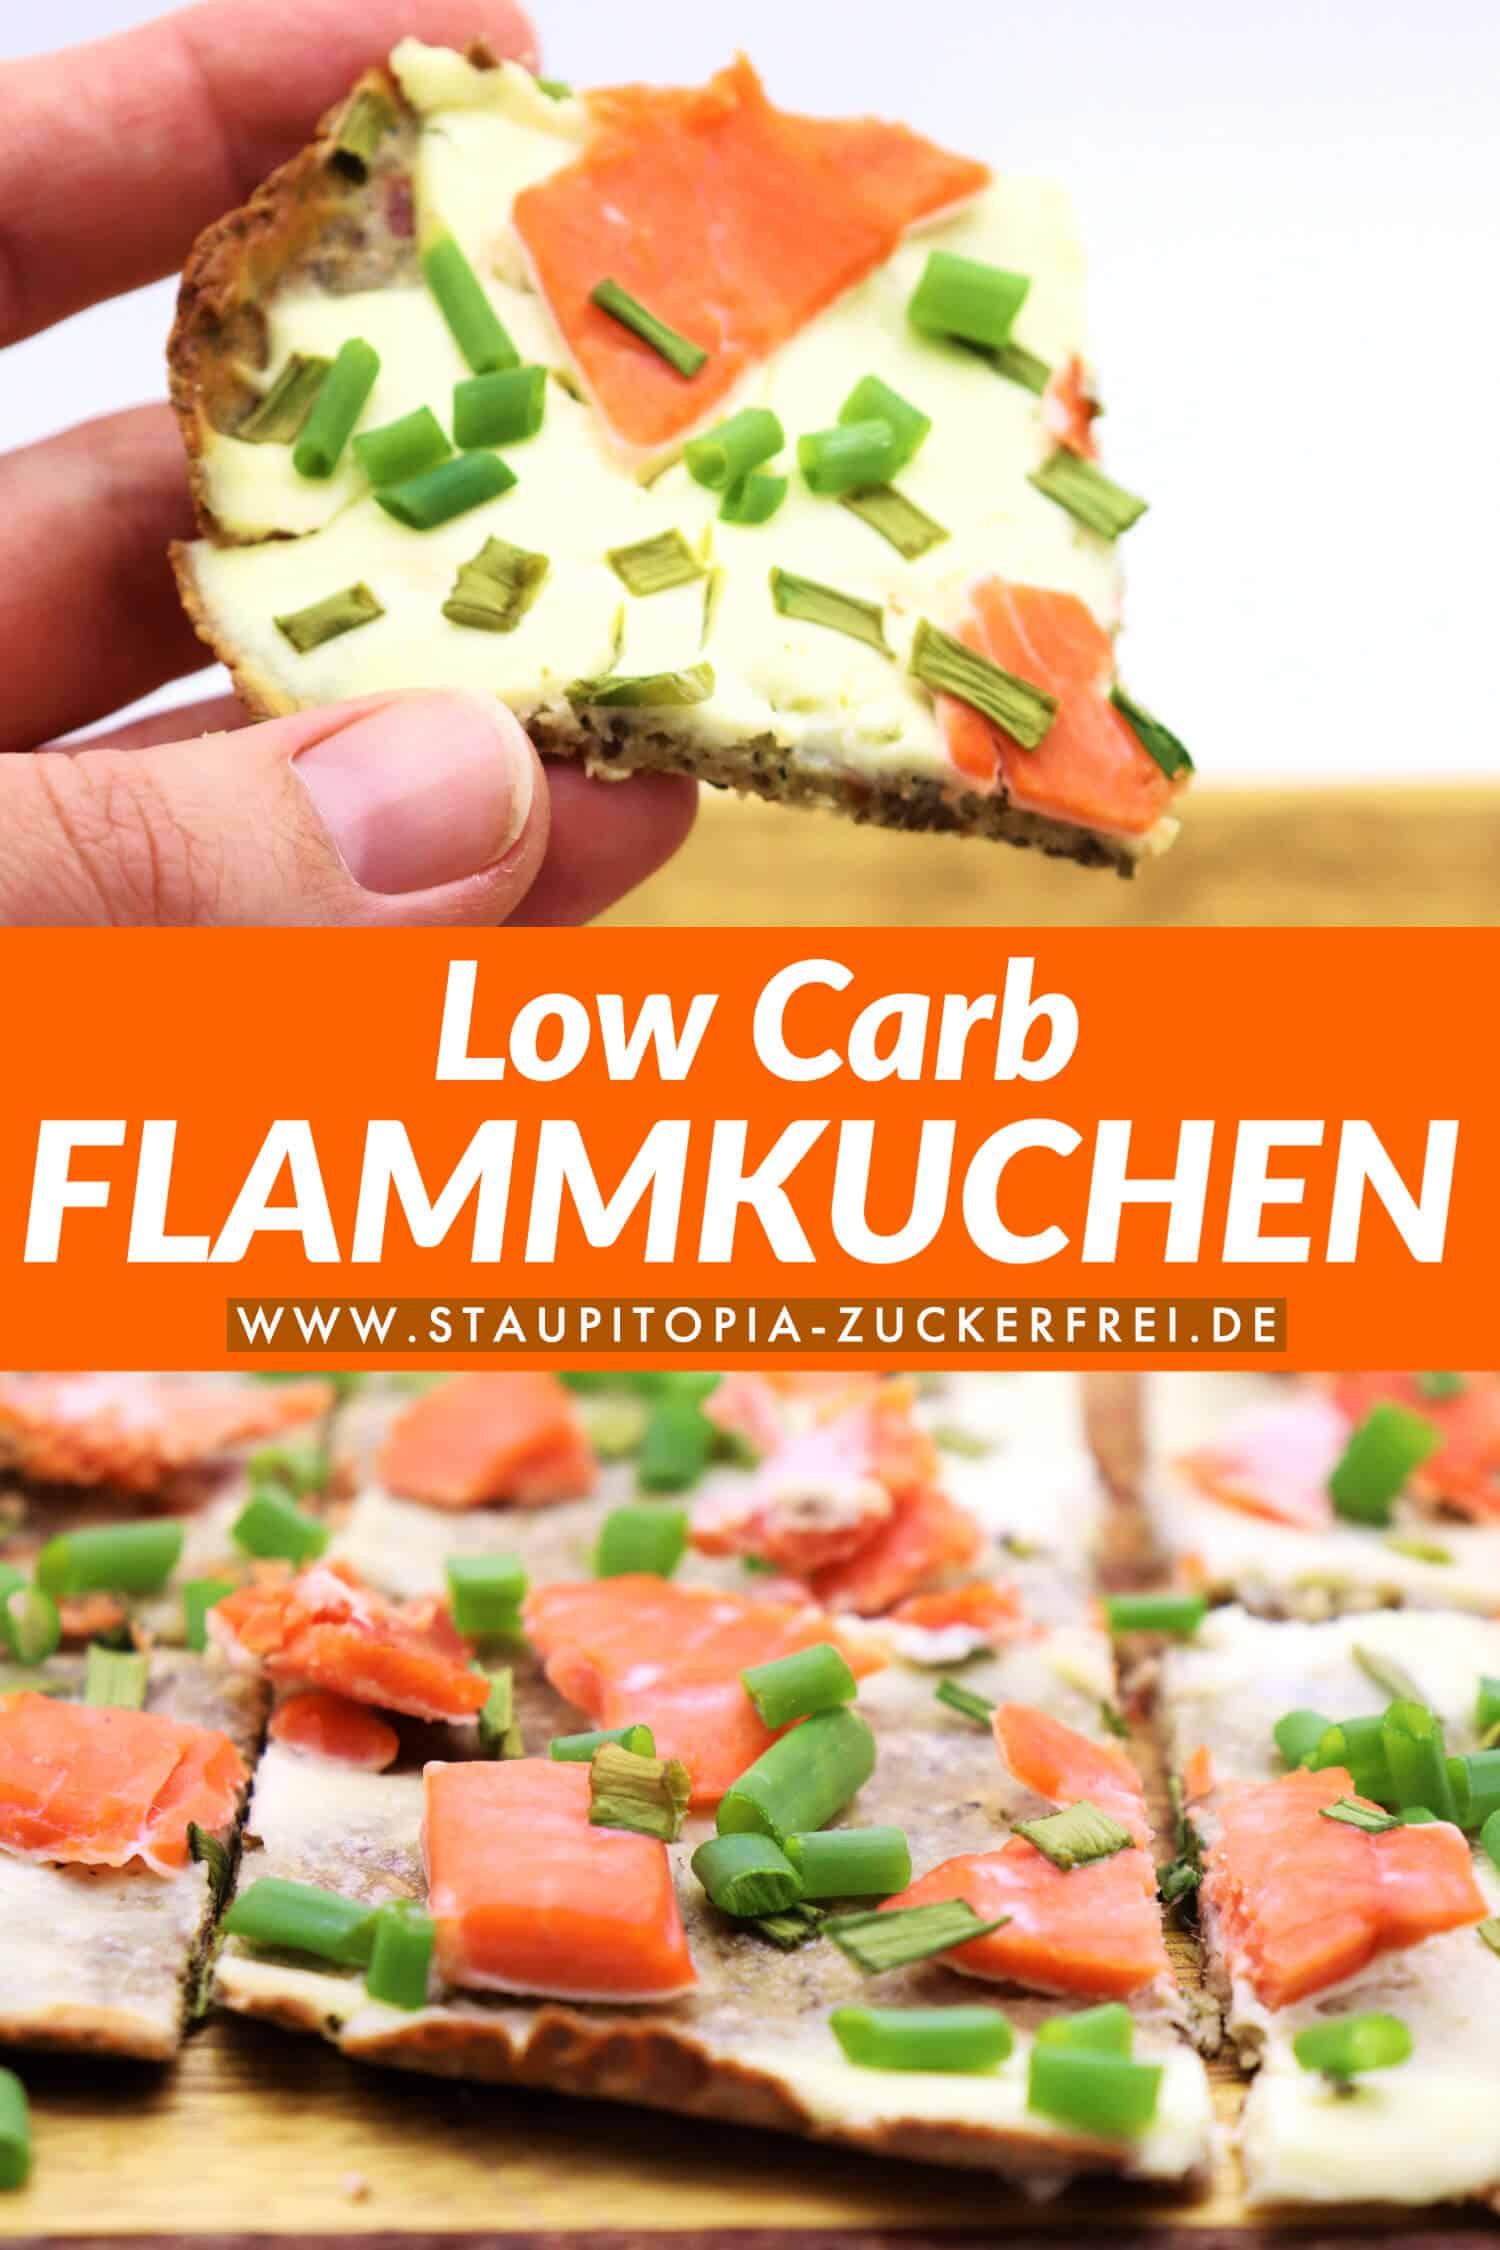 Low Carb Flammkuchen Rezept ohne Kohlenhydrate